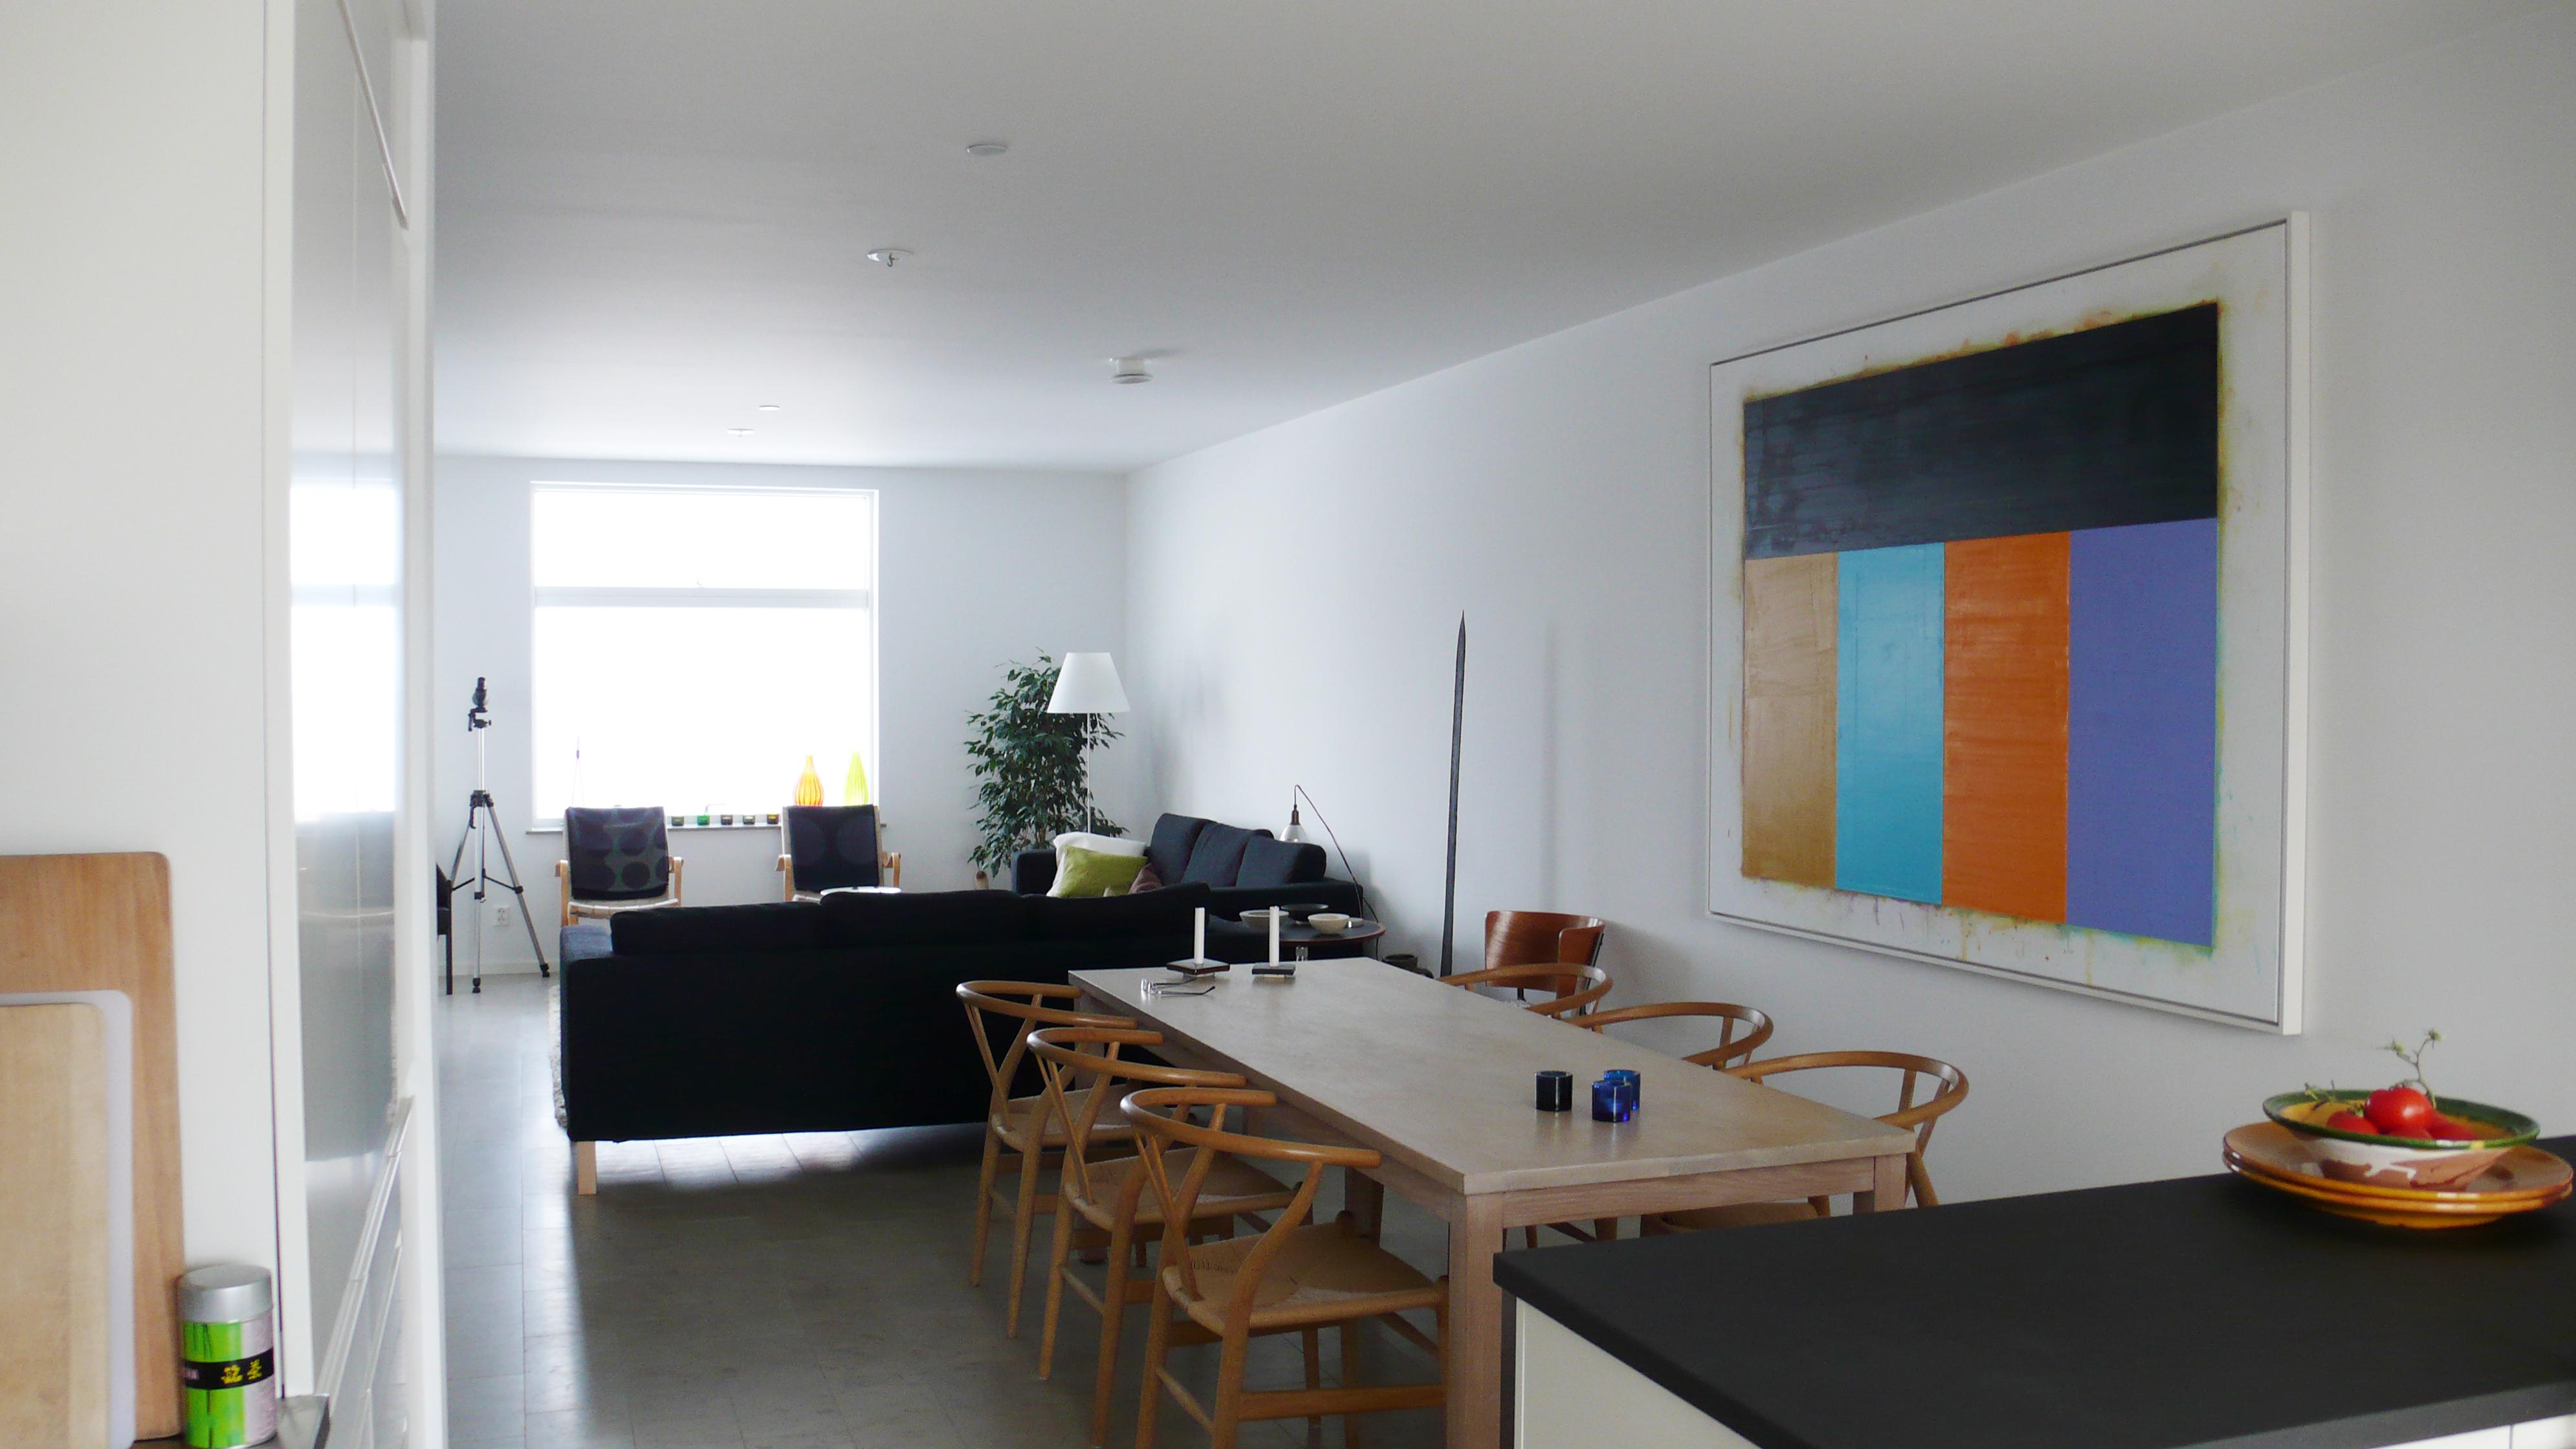 anlita-arkitekt-aha-arkitekter-flagghusen8